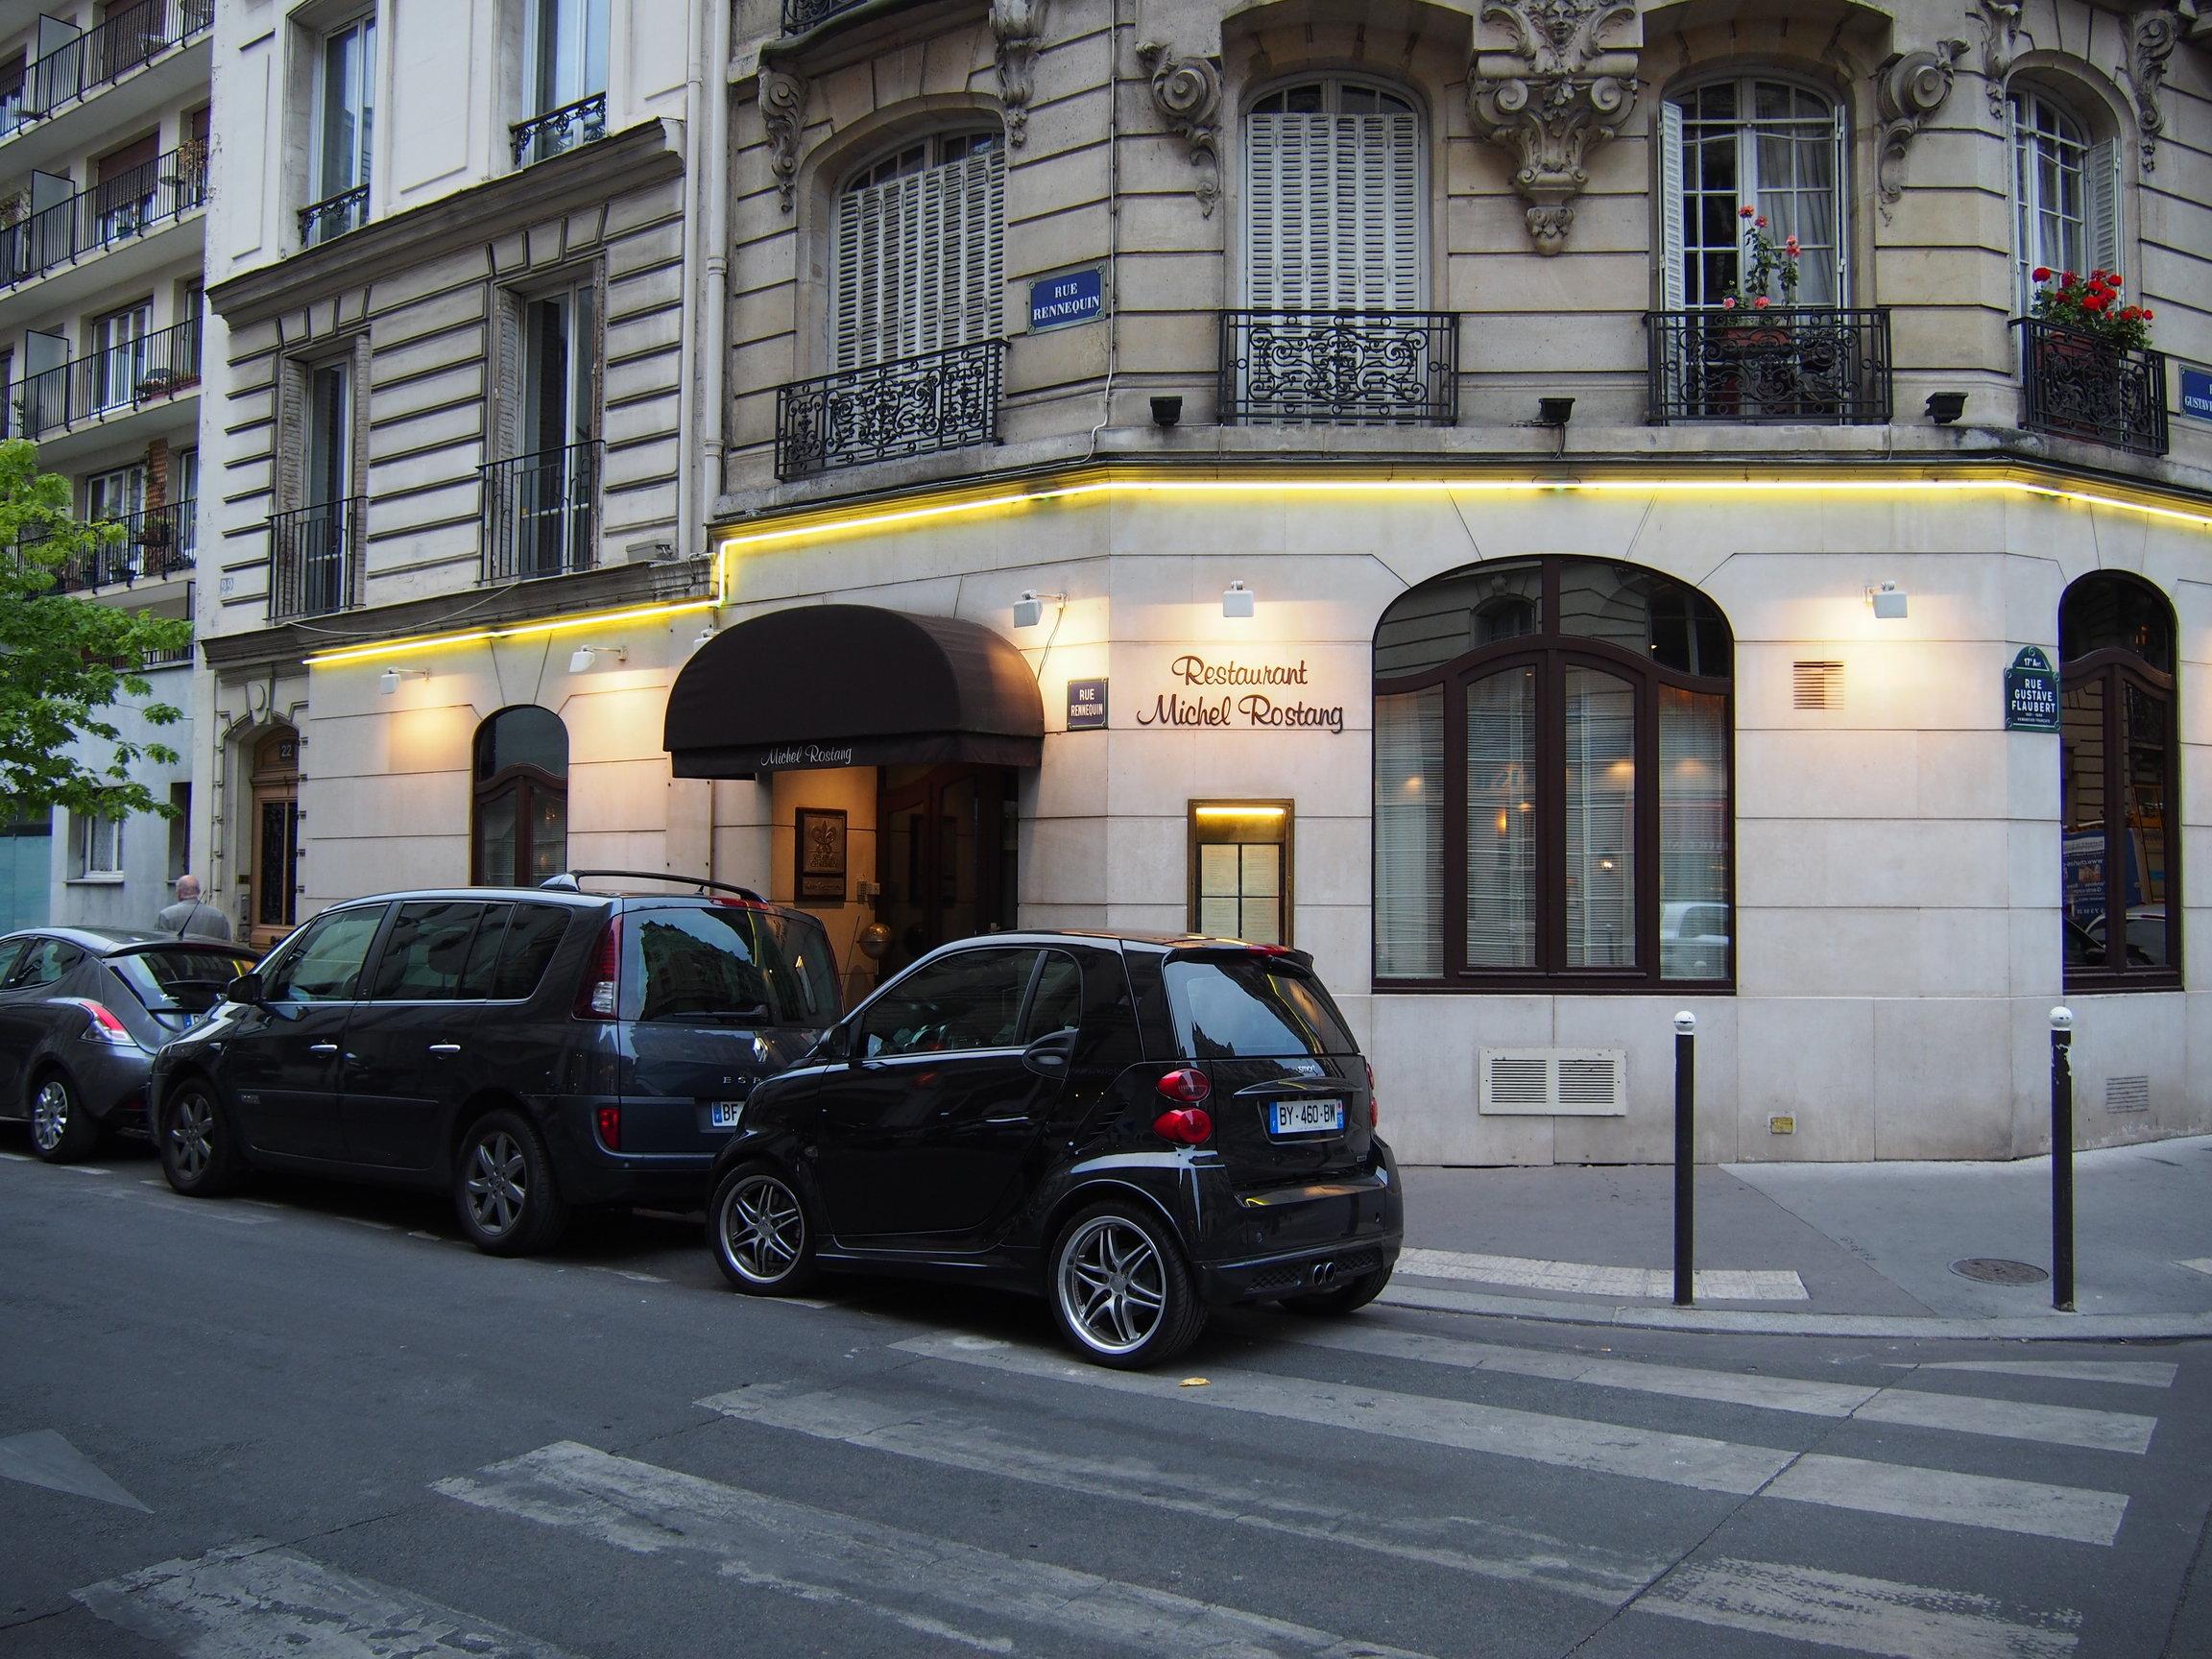 Michel rostang paris go by st lsvik for Restaurant michel rostang